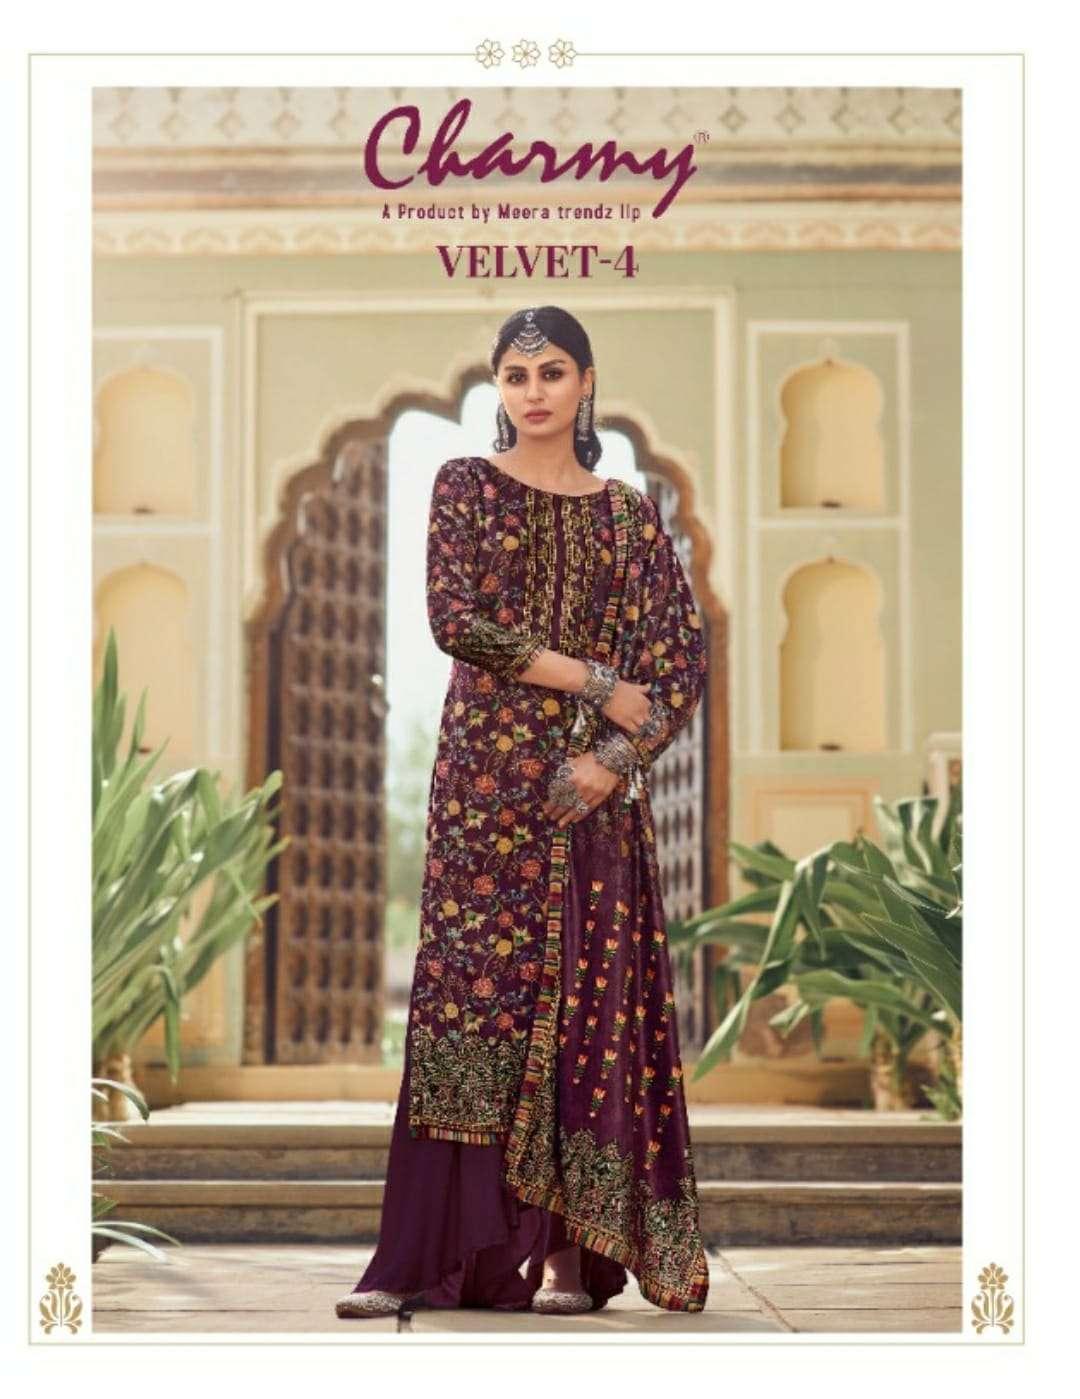 meera Trendz Charmy Velvet Vol 4 Velvet Digital Print Pashmina Suits Collection